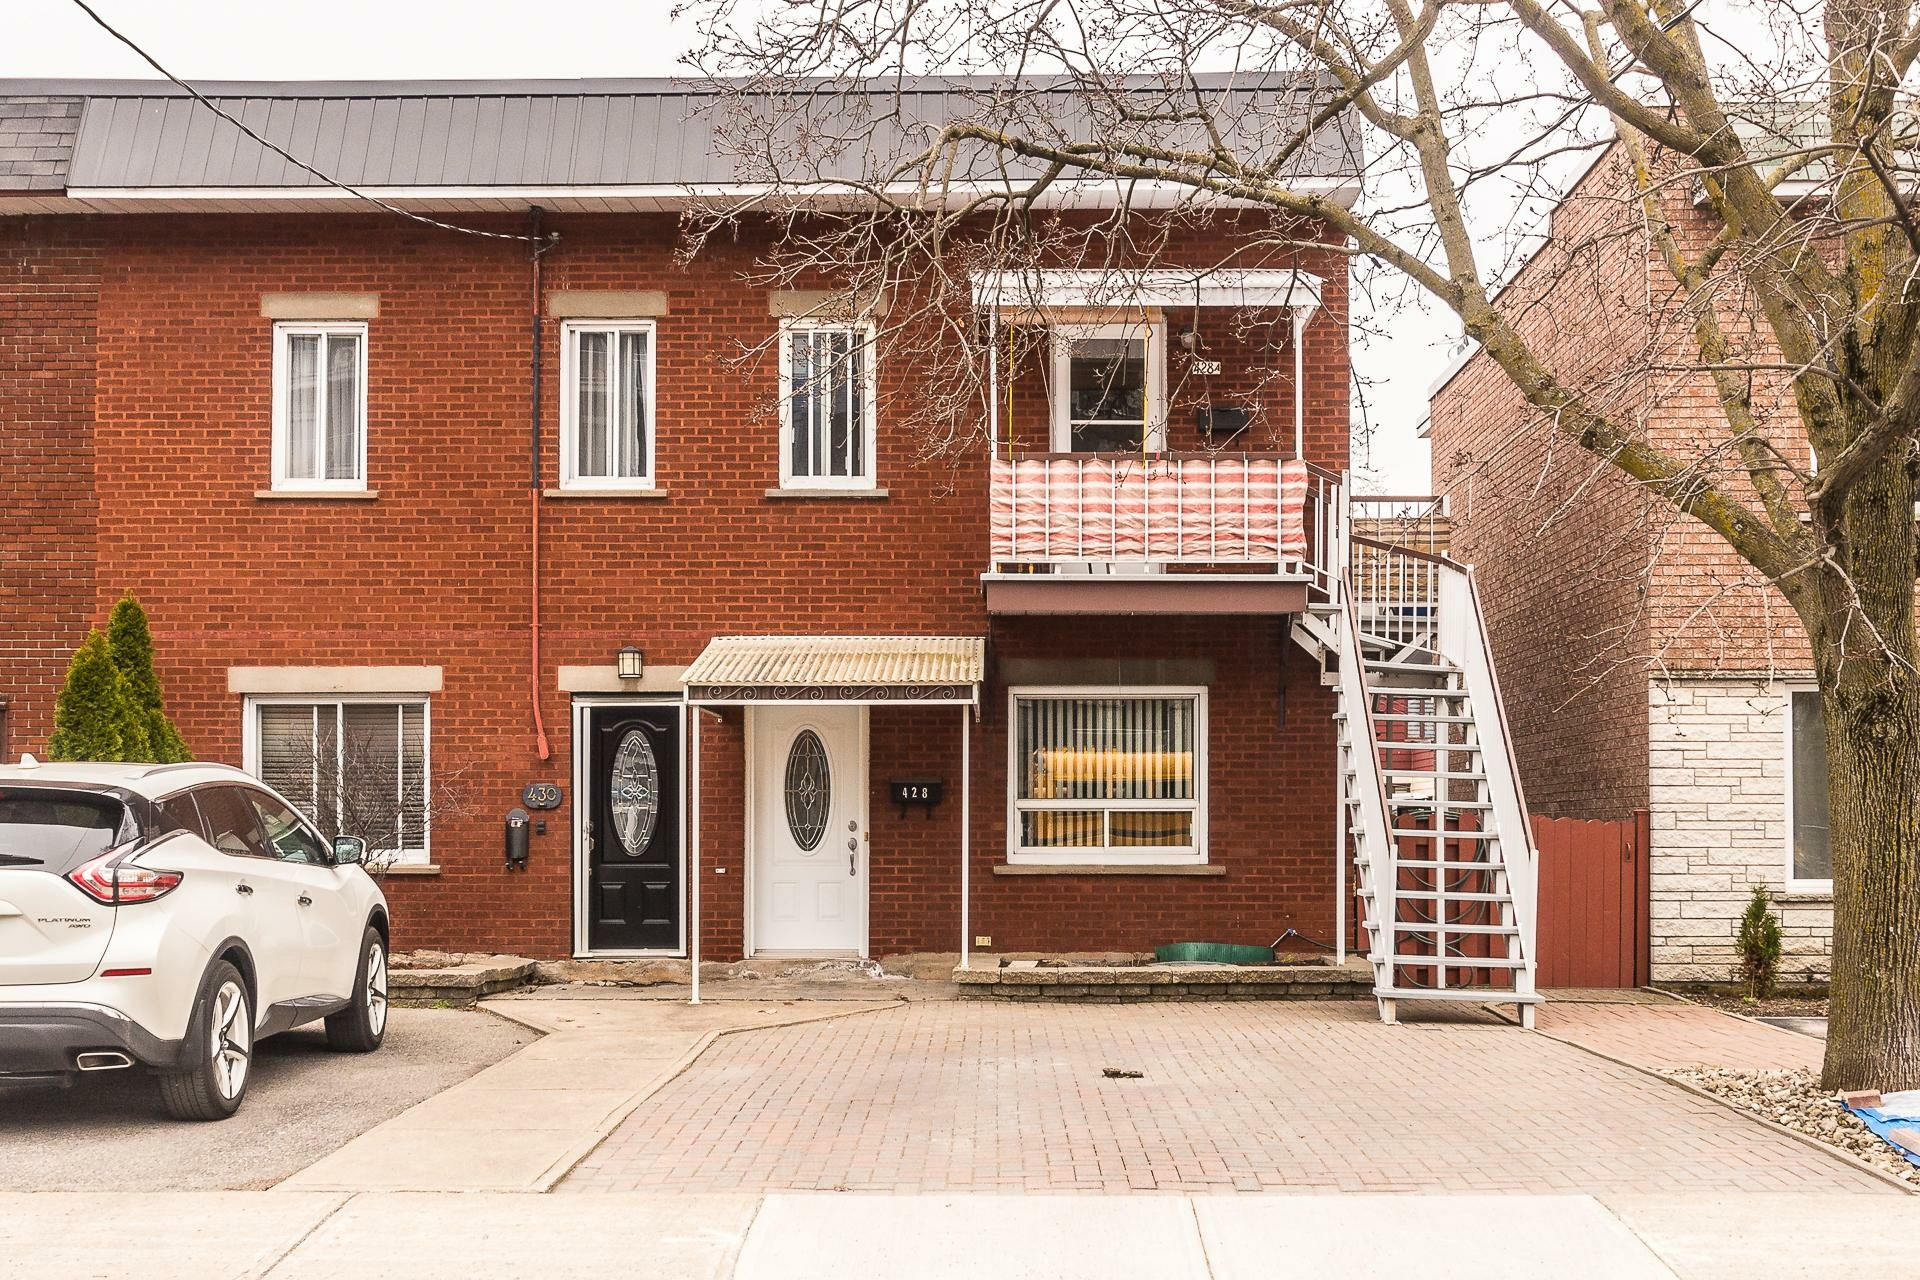 image 0 - Duplex En venta Montréal Lachine  - 3 habitaciones